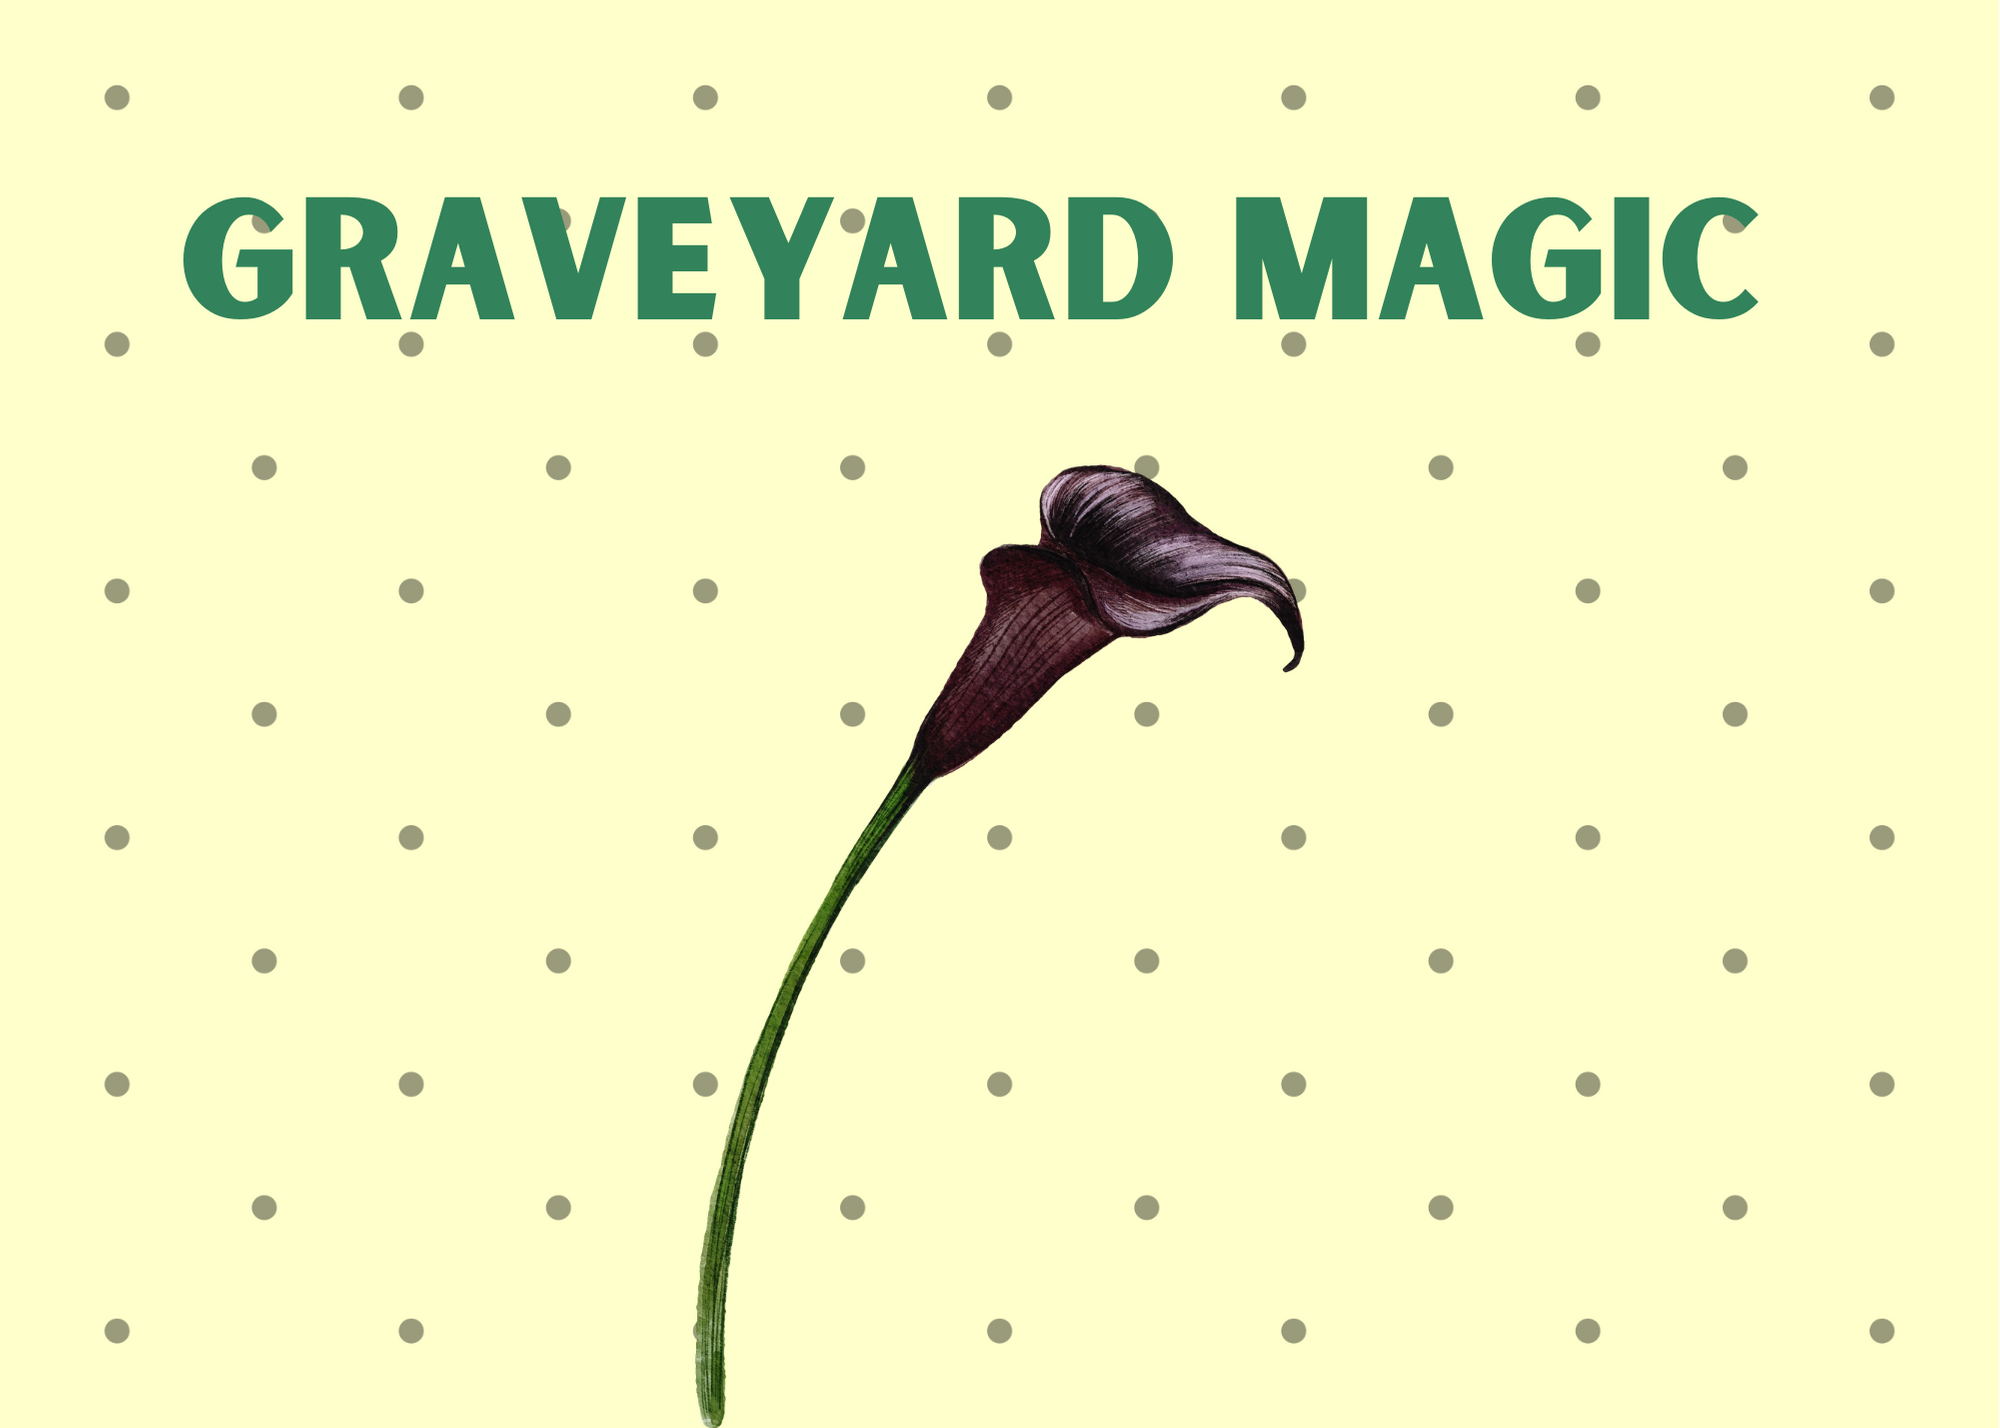 Graveyard Dirt, Graveyard Spells, Graveyard magic, graveyard goddesses, spirit work, ghosts, ancestors